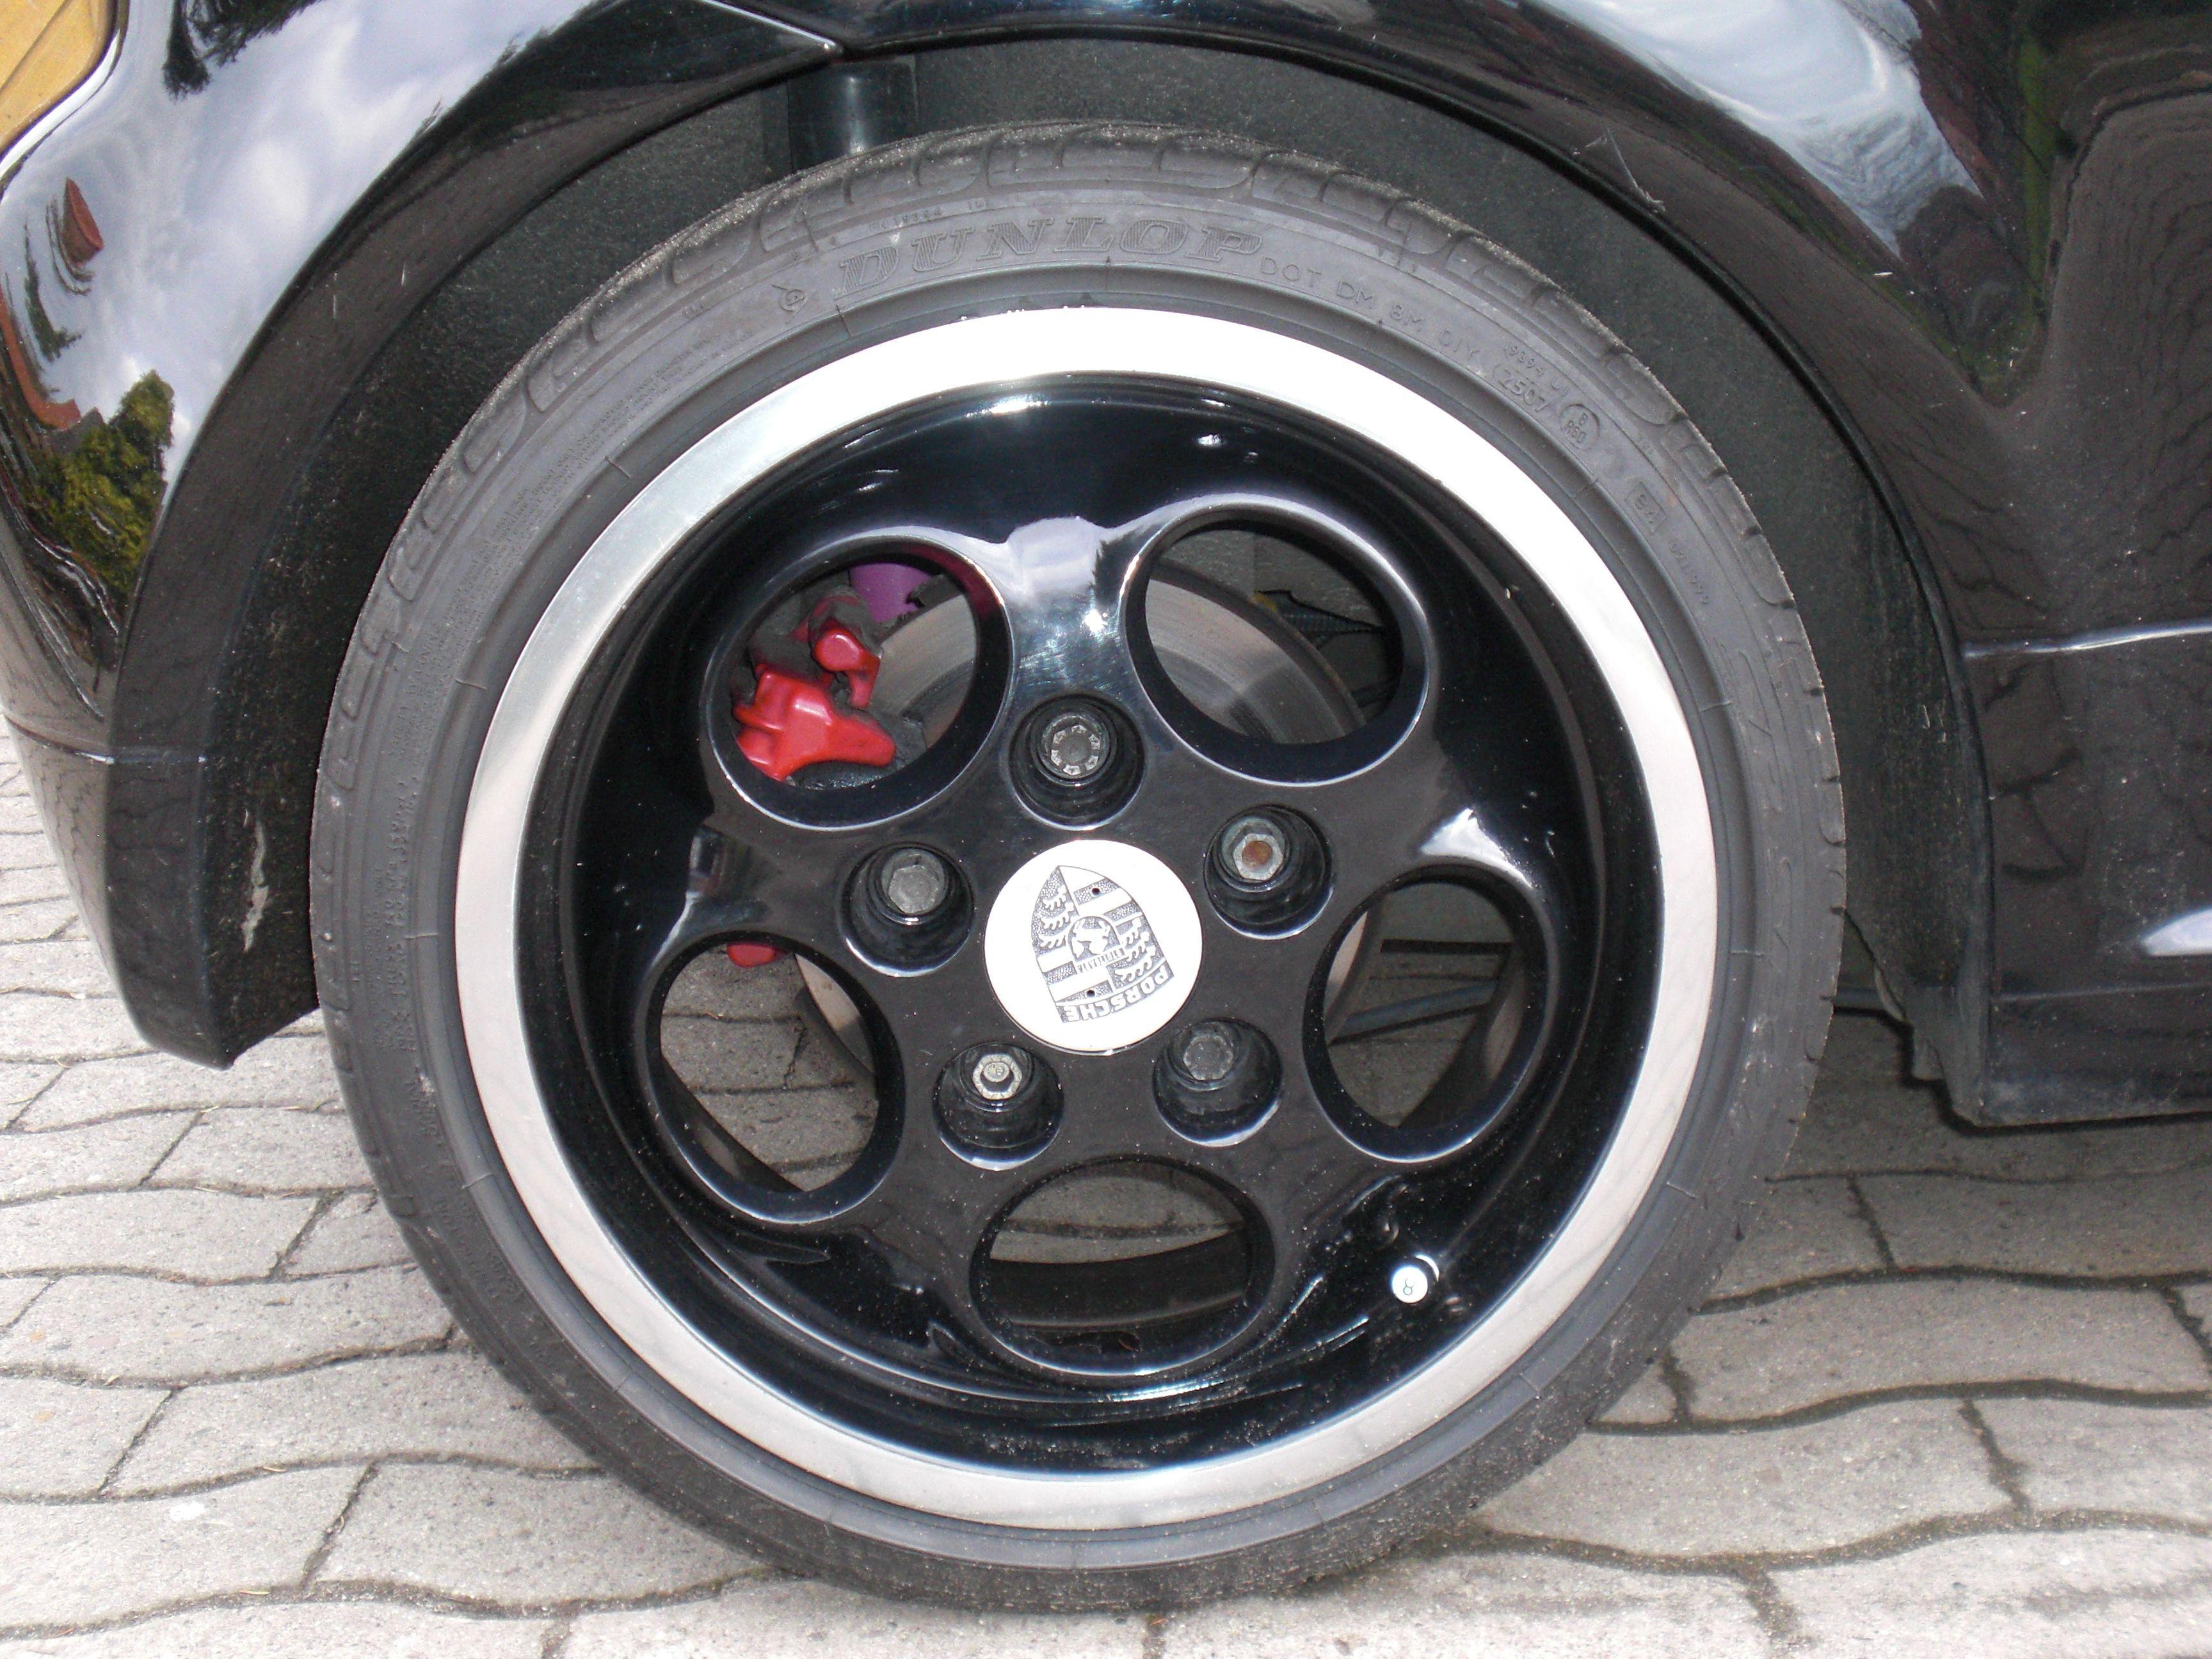 Black Telefon Porsche Wheels On A Vw Lupo Wheels